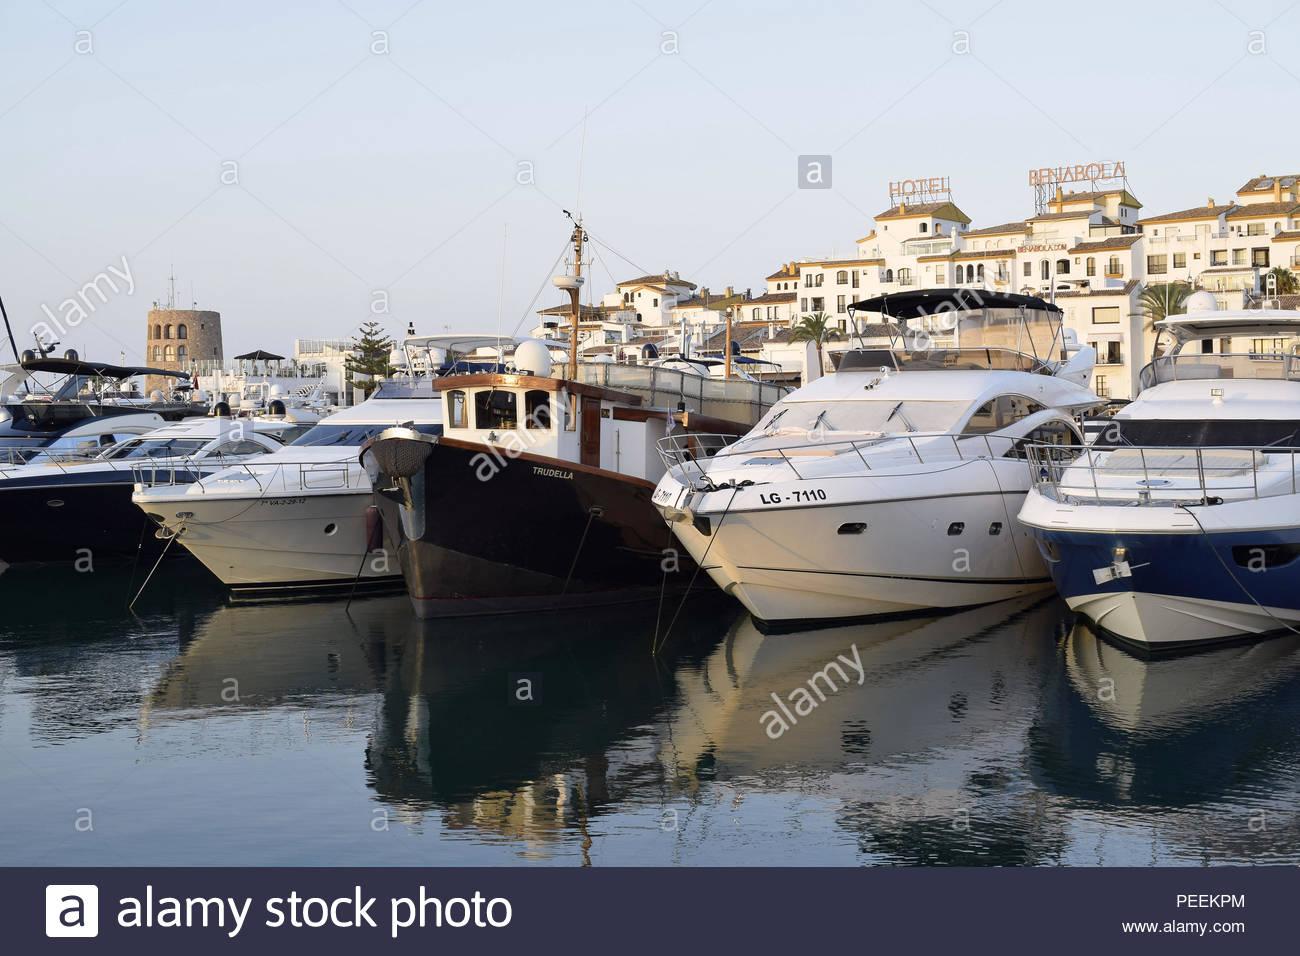 Modern yachts in harbor at dawn, Puerto Banus - luxury